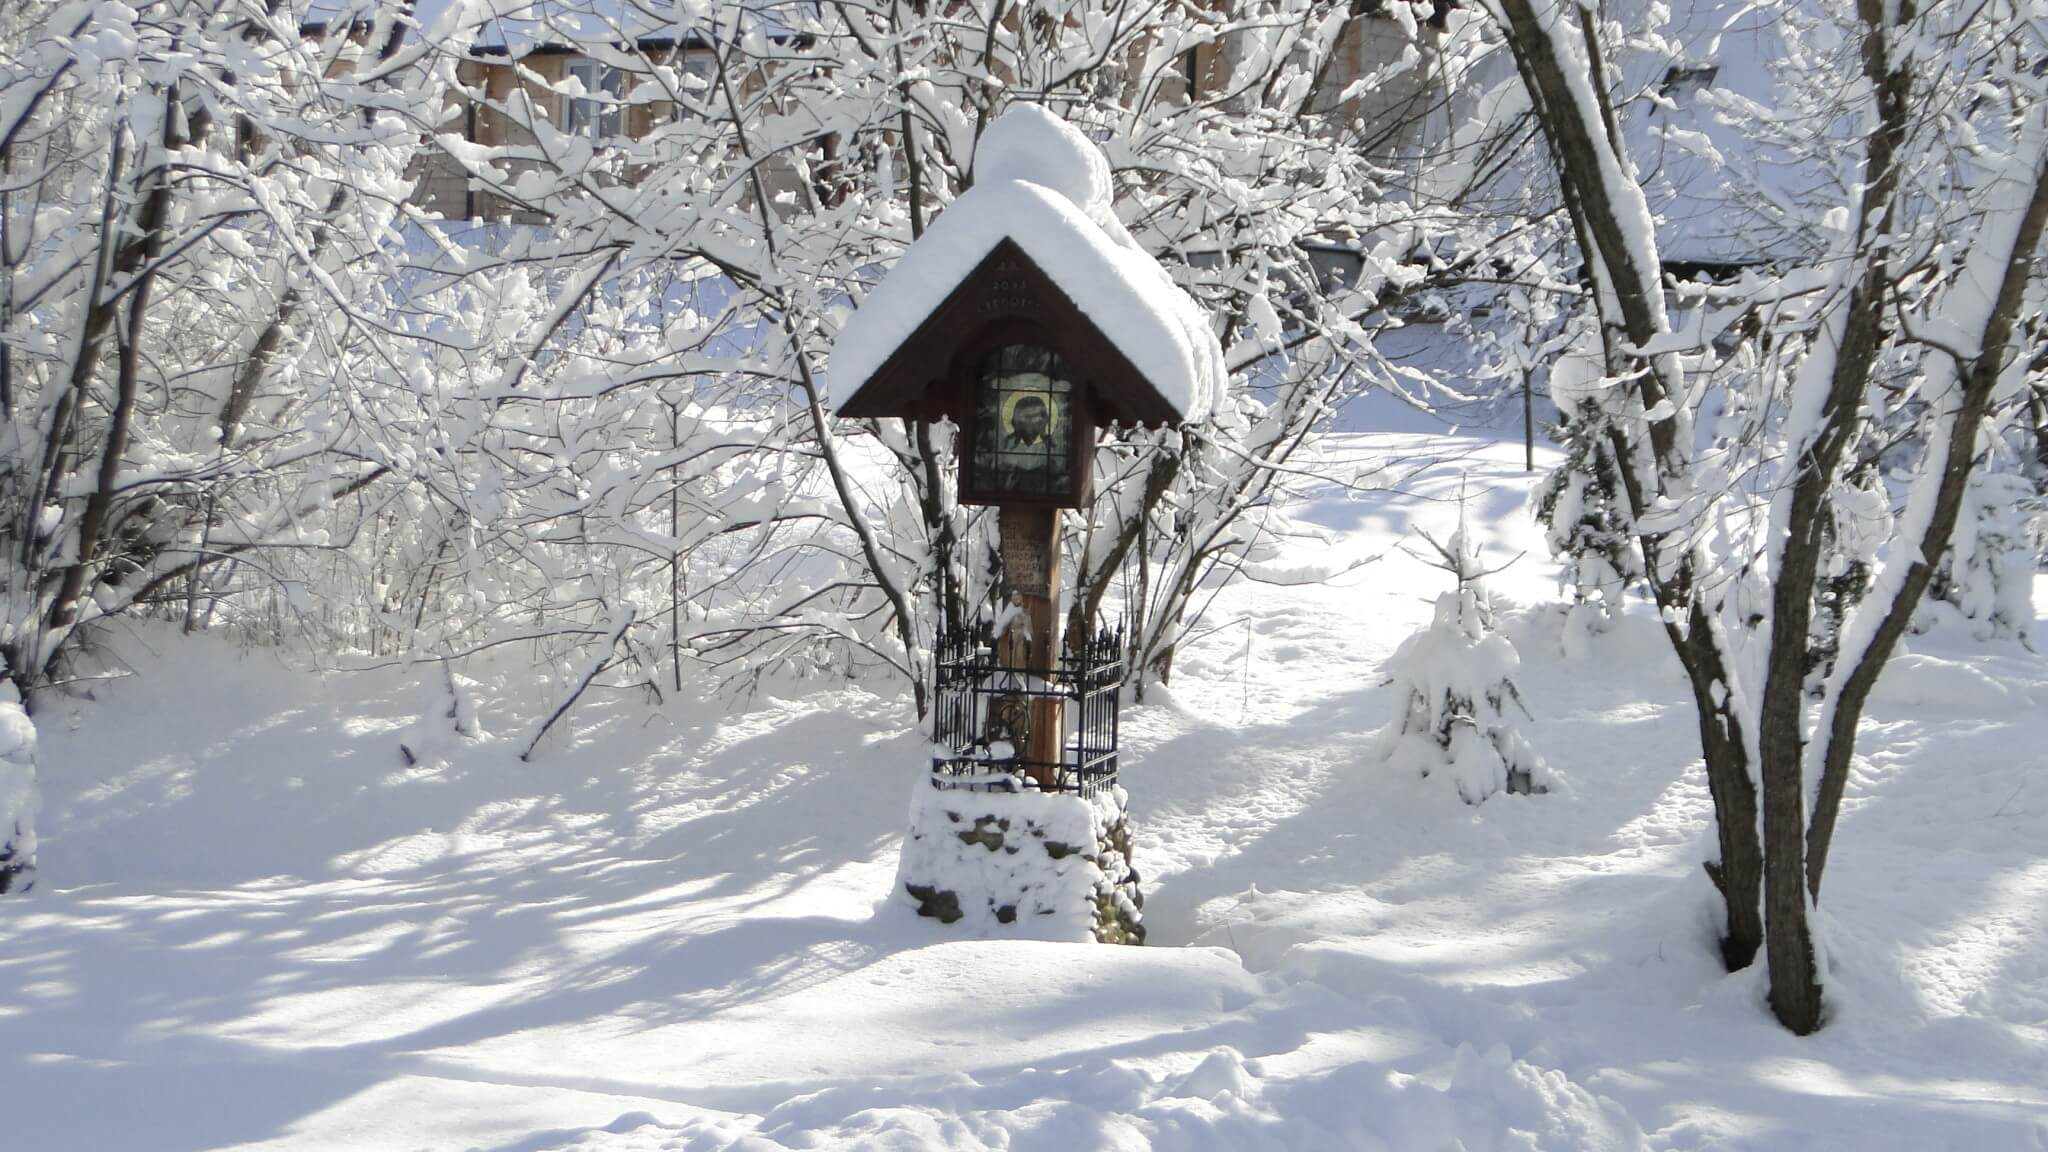 Lutowa zima - śnieżna i mroźna 10